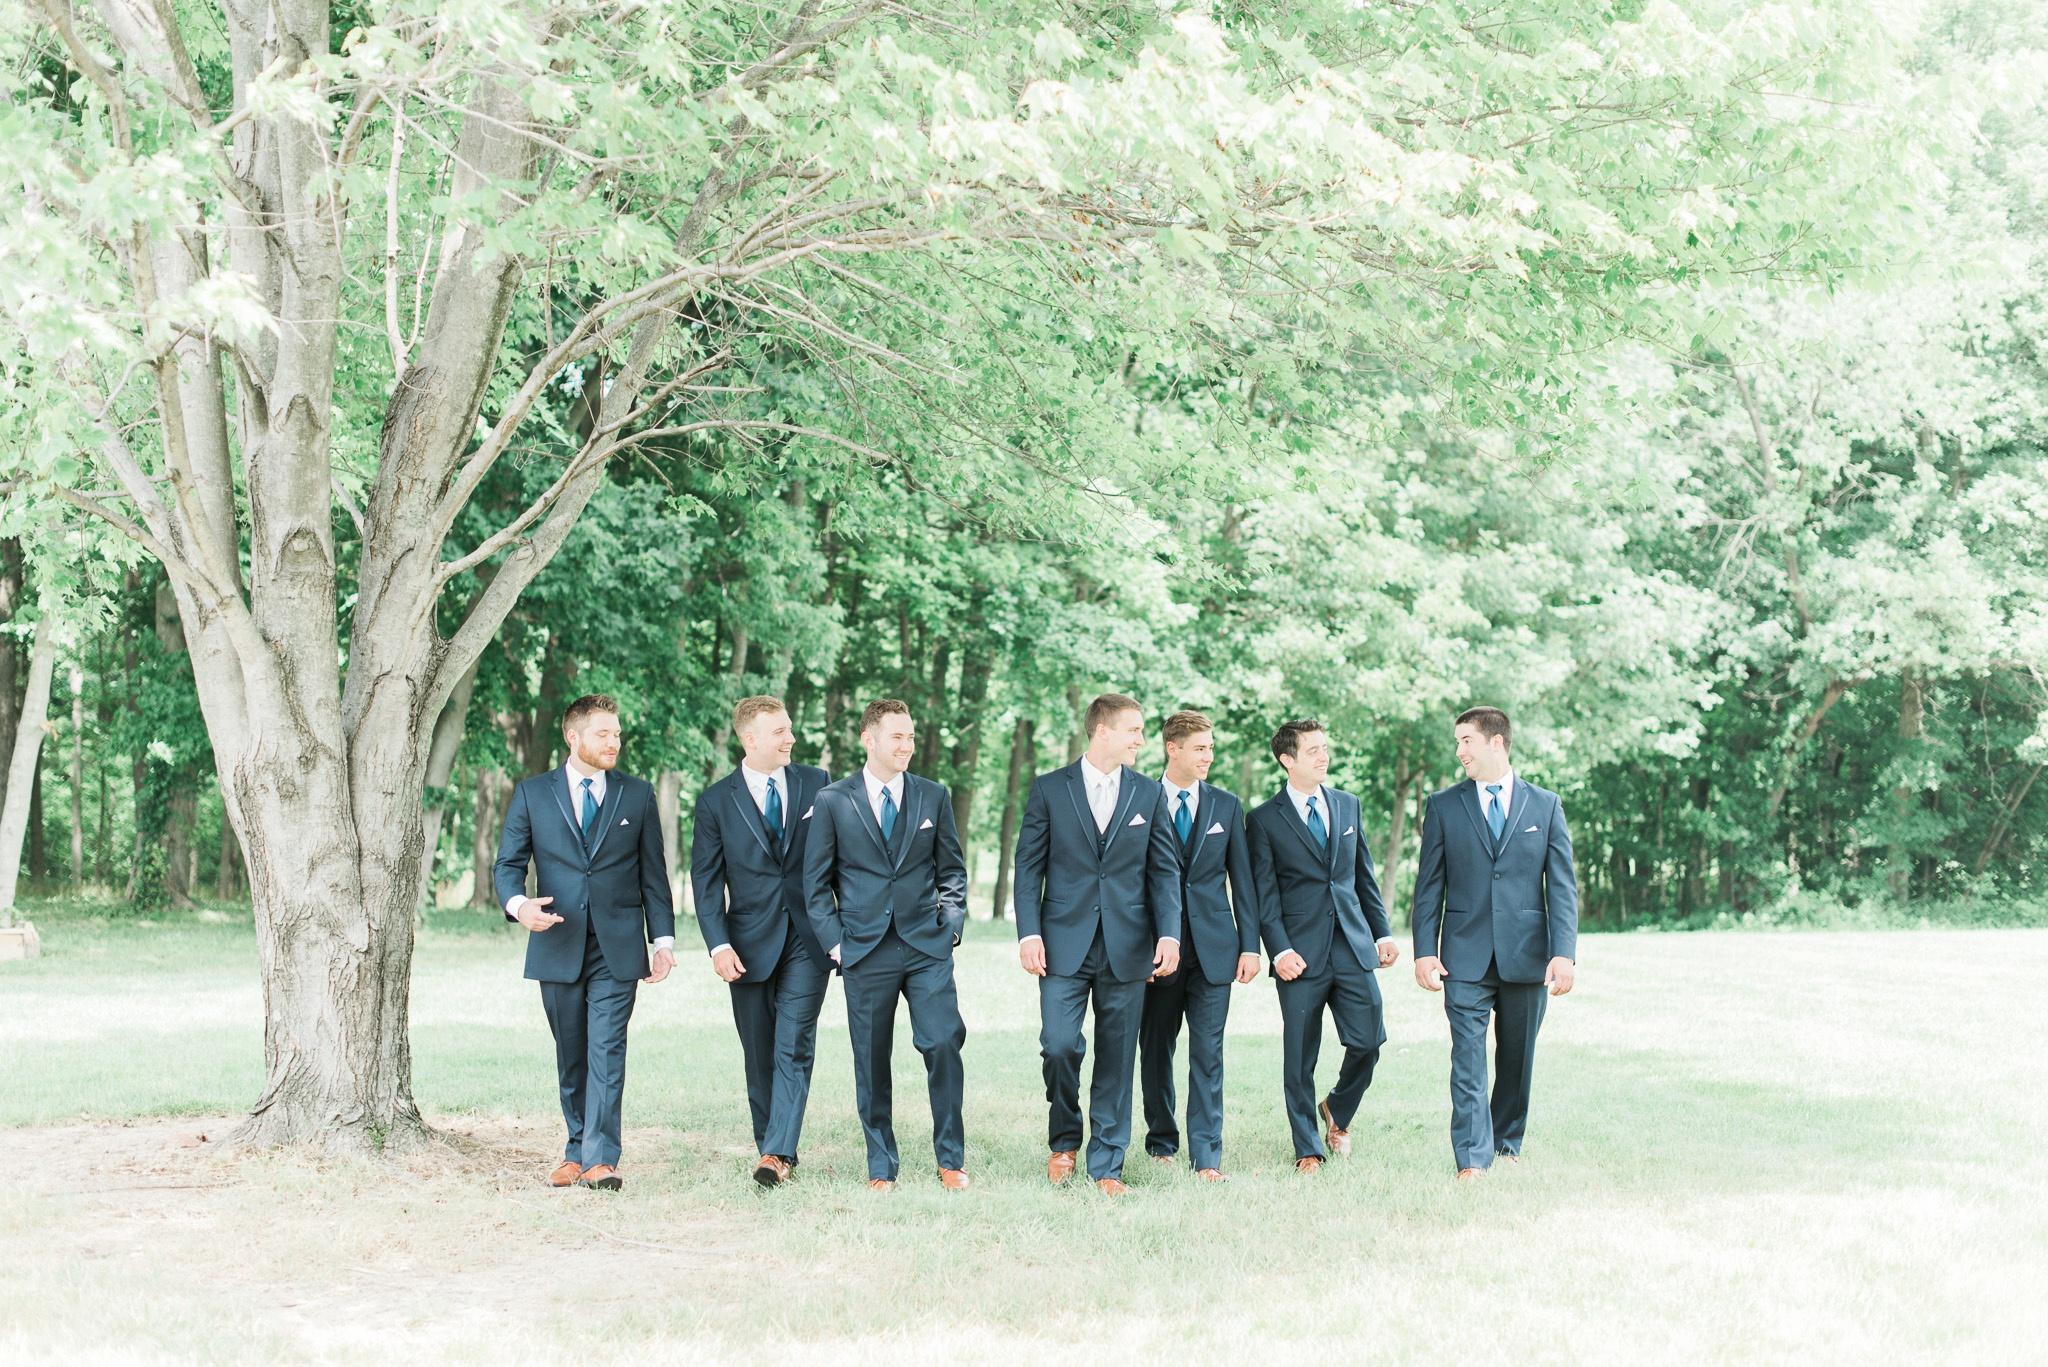 sunbury-ohio-wedding-hannah-johnathan_0050.jpg